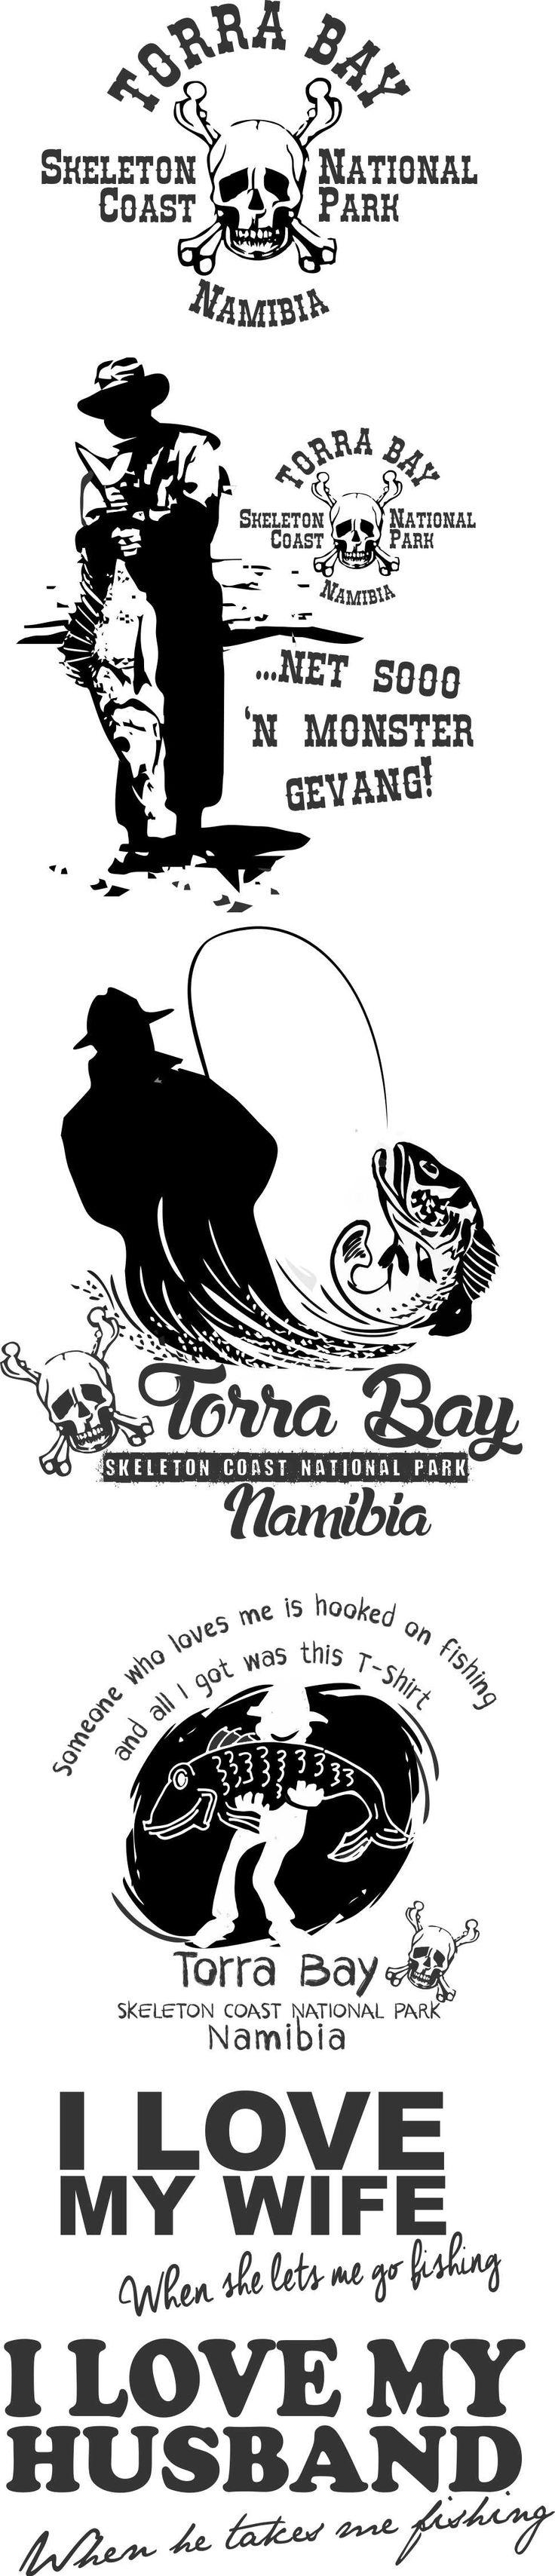 Designs for Torra Bay in the Skeleton Coast National Park, Namibia. #skeletoncoast #torrabay #fishing #design #namibia